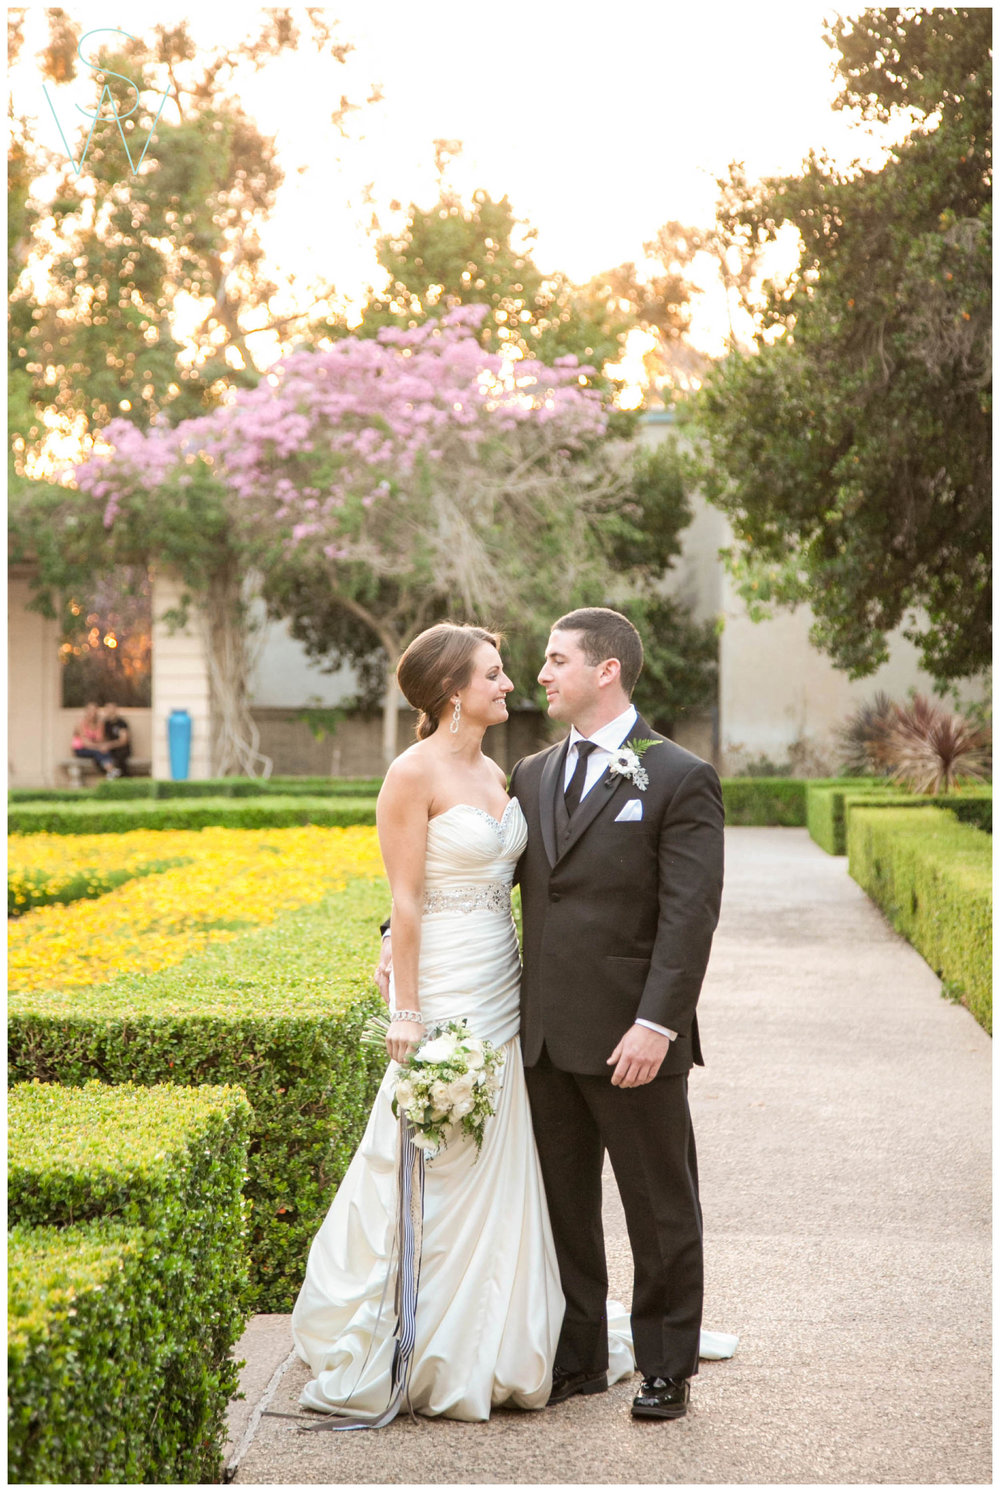 Shewanders.sdma_.wedding.photography-1041.jpg.wedding.photography-1041.jpg